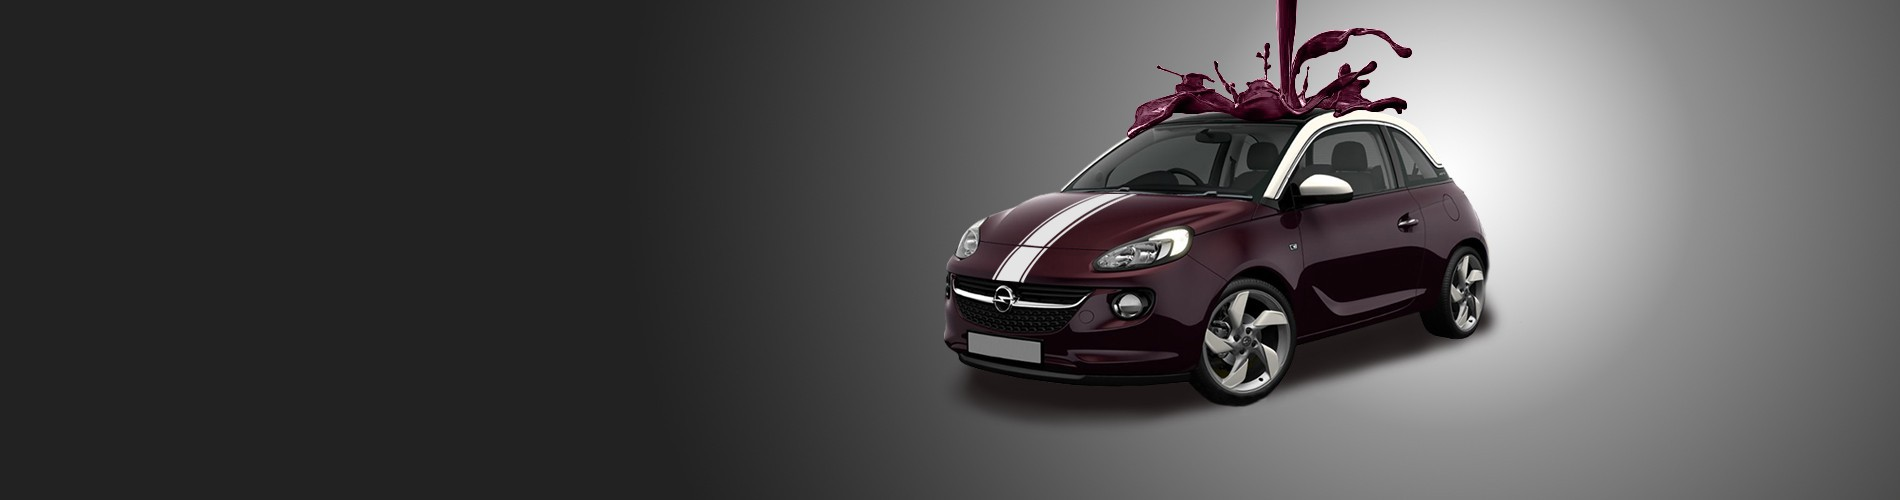 My Beautiful Car - Opel Decals